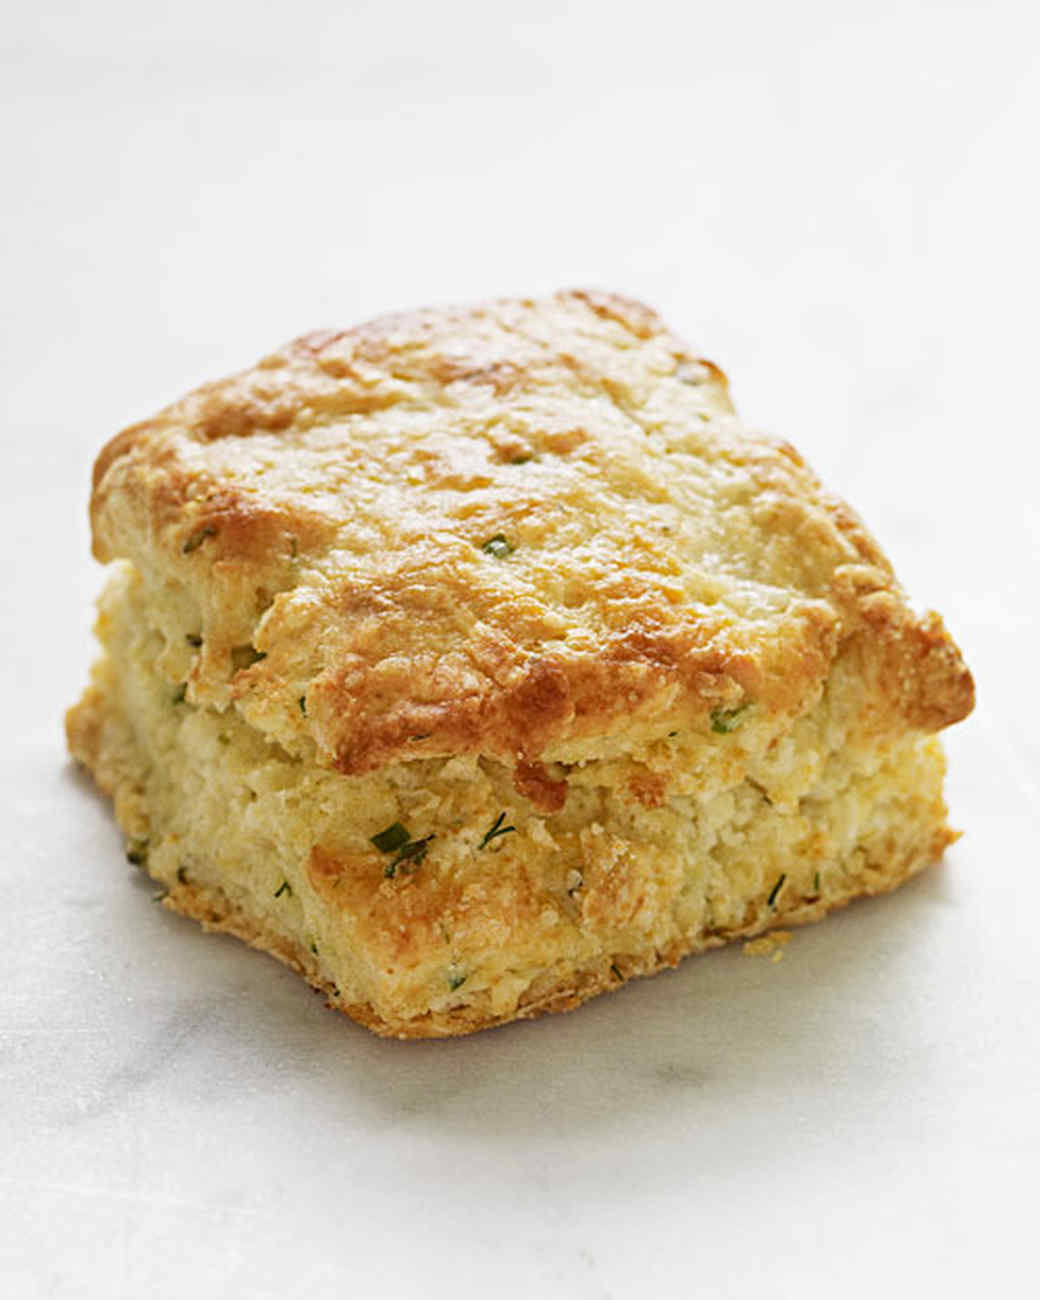 mb_1012_buttermilk_biscuits.jpg